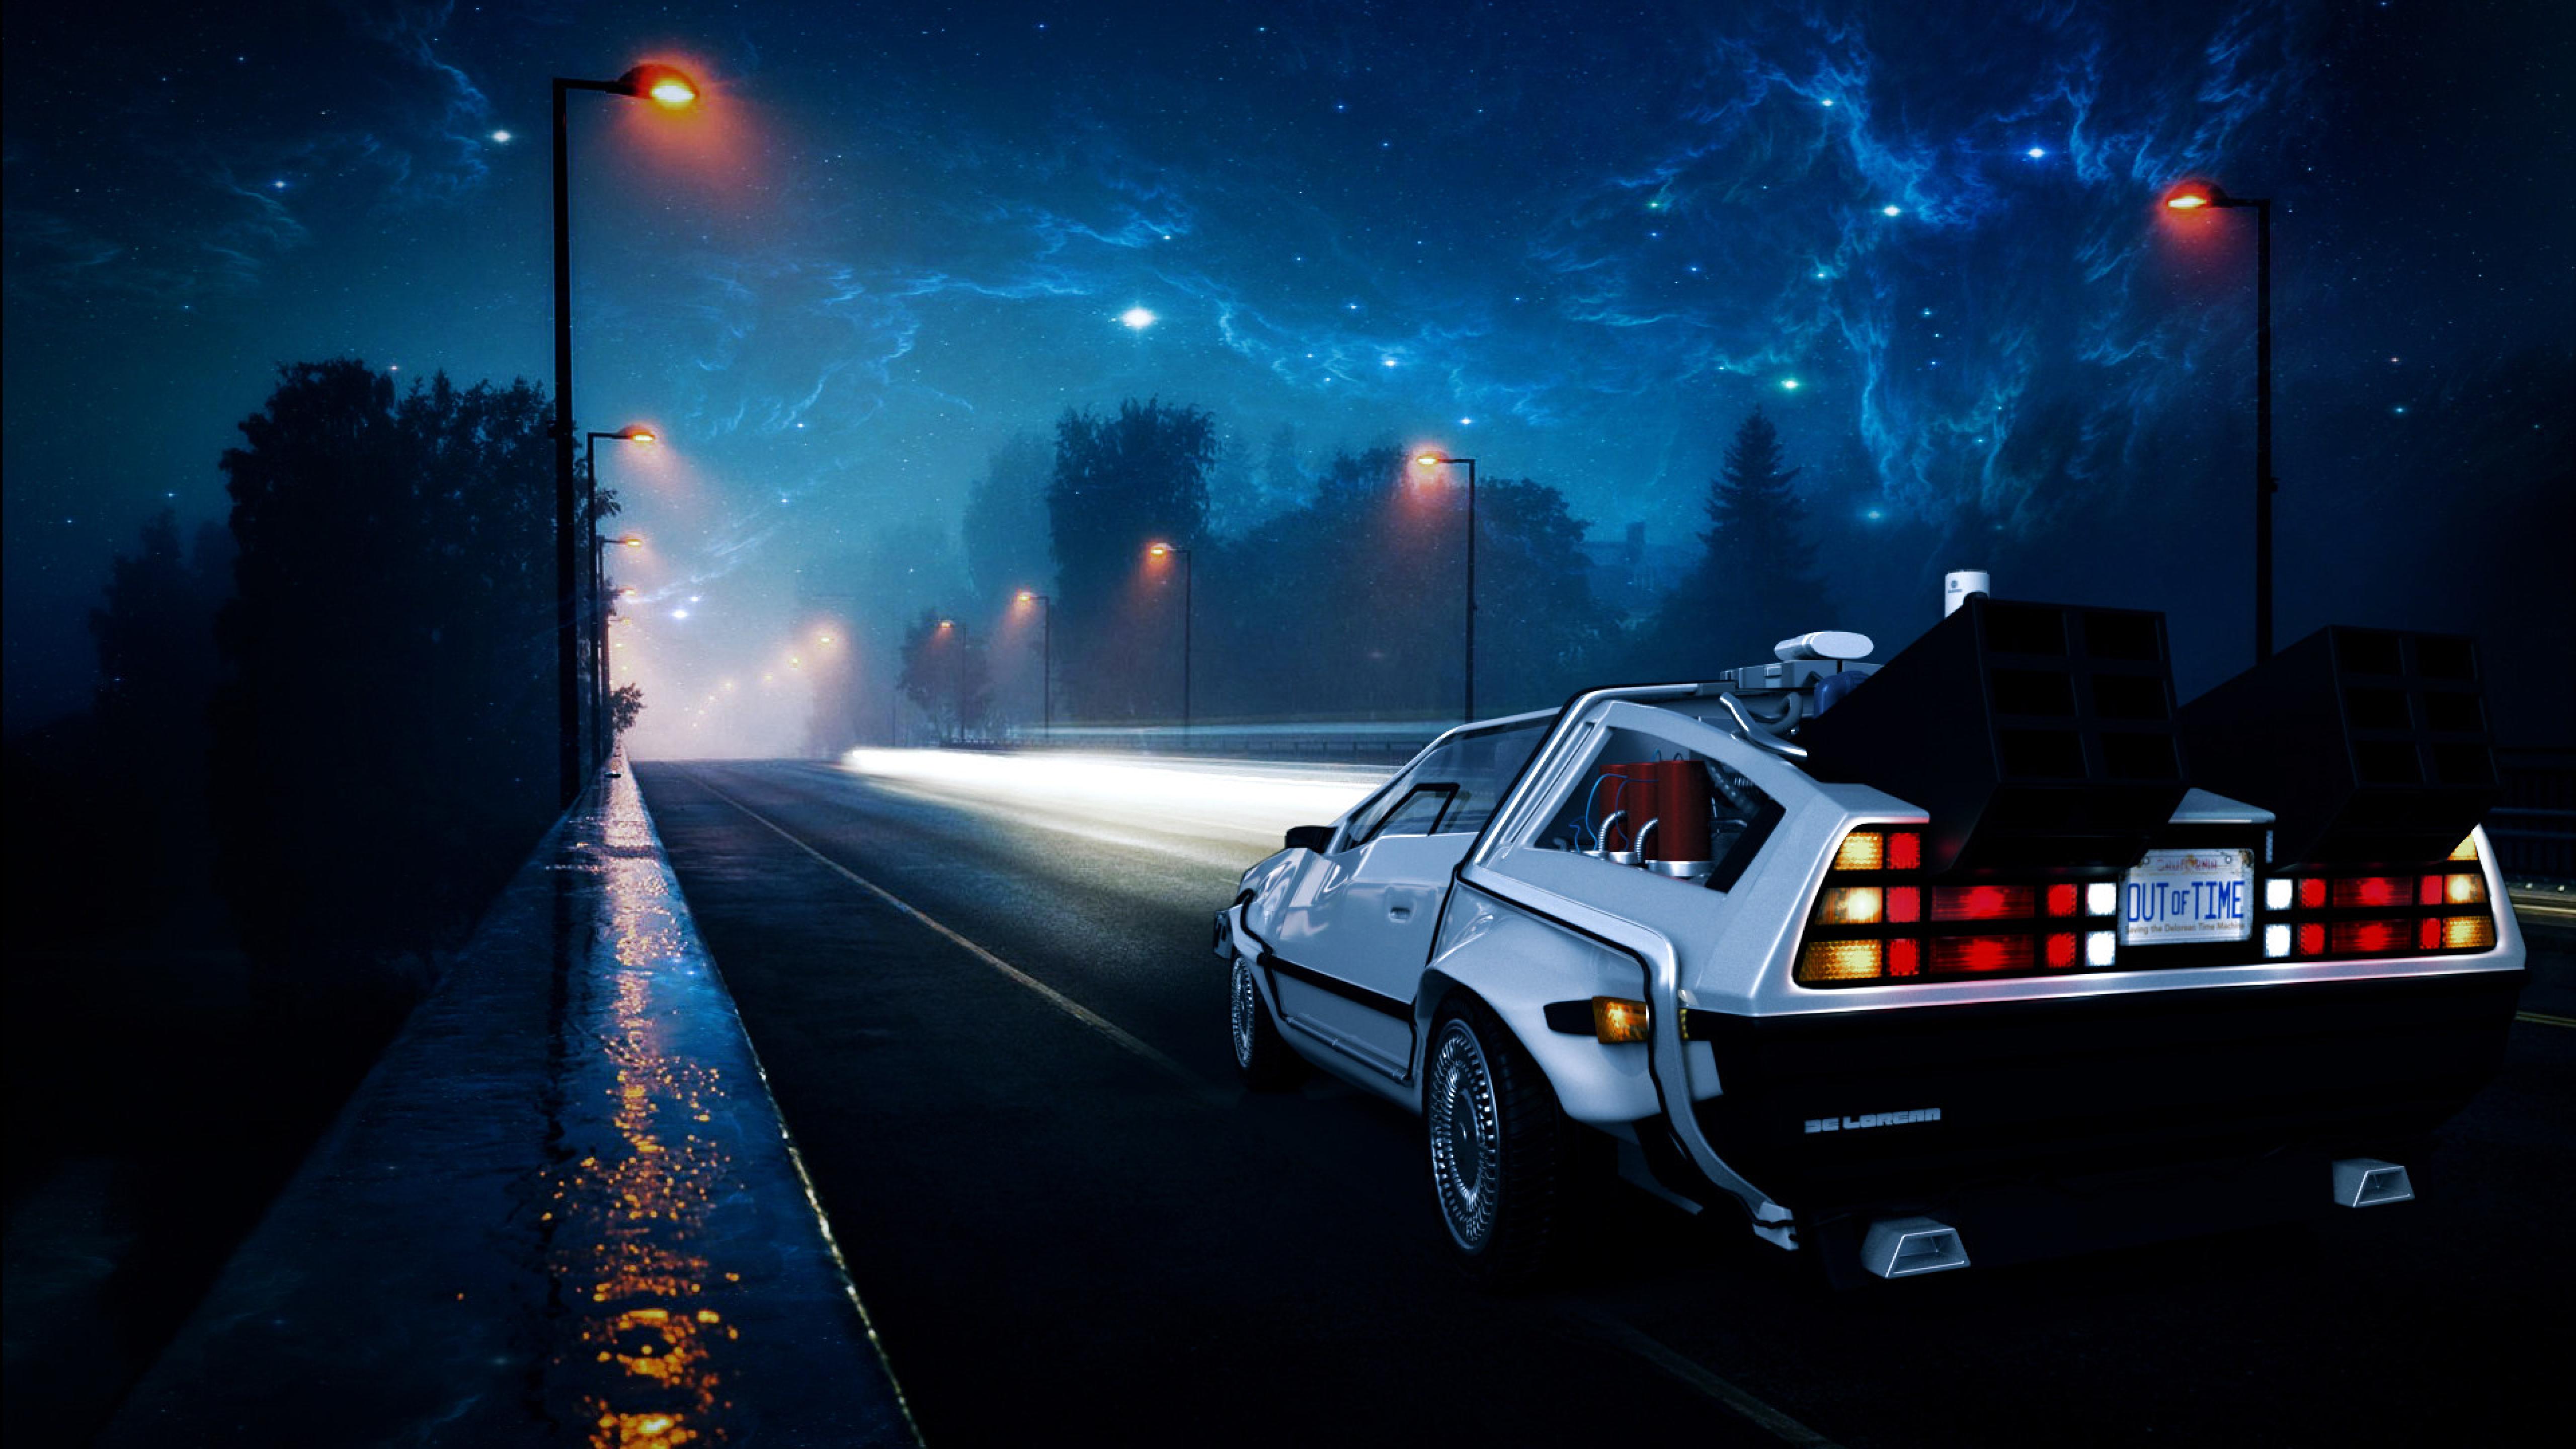 Back To The Future Delorean Car Illustration, Full HD ...